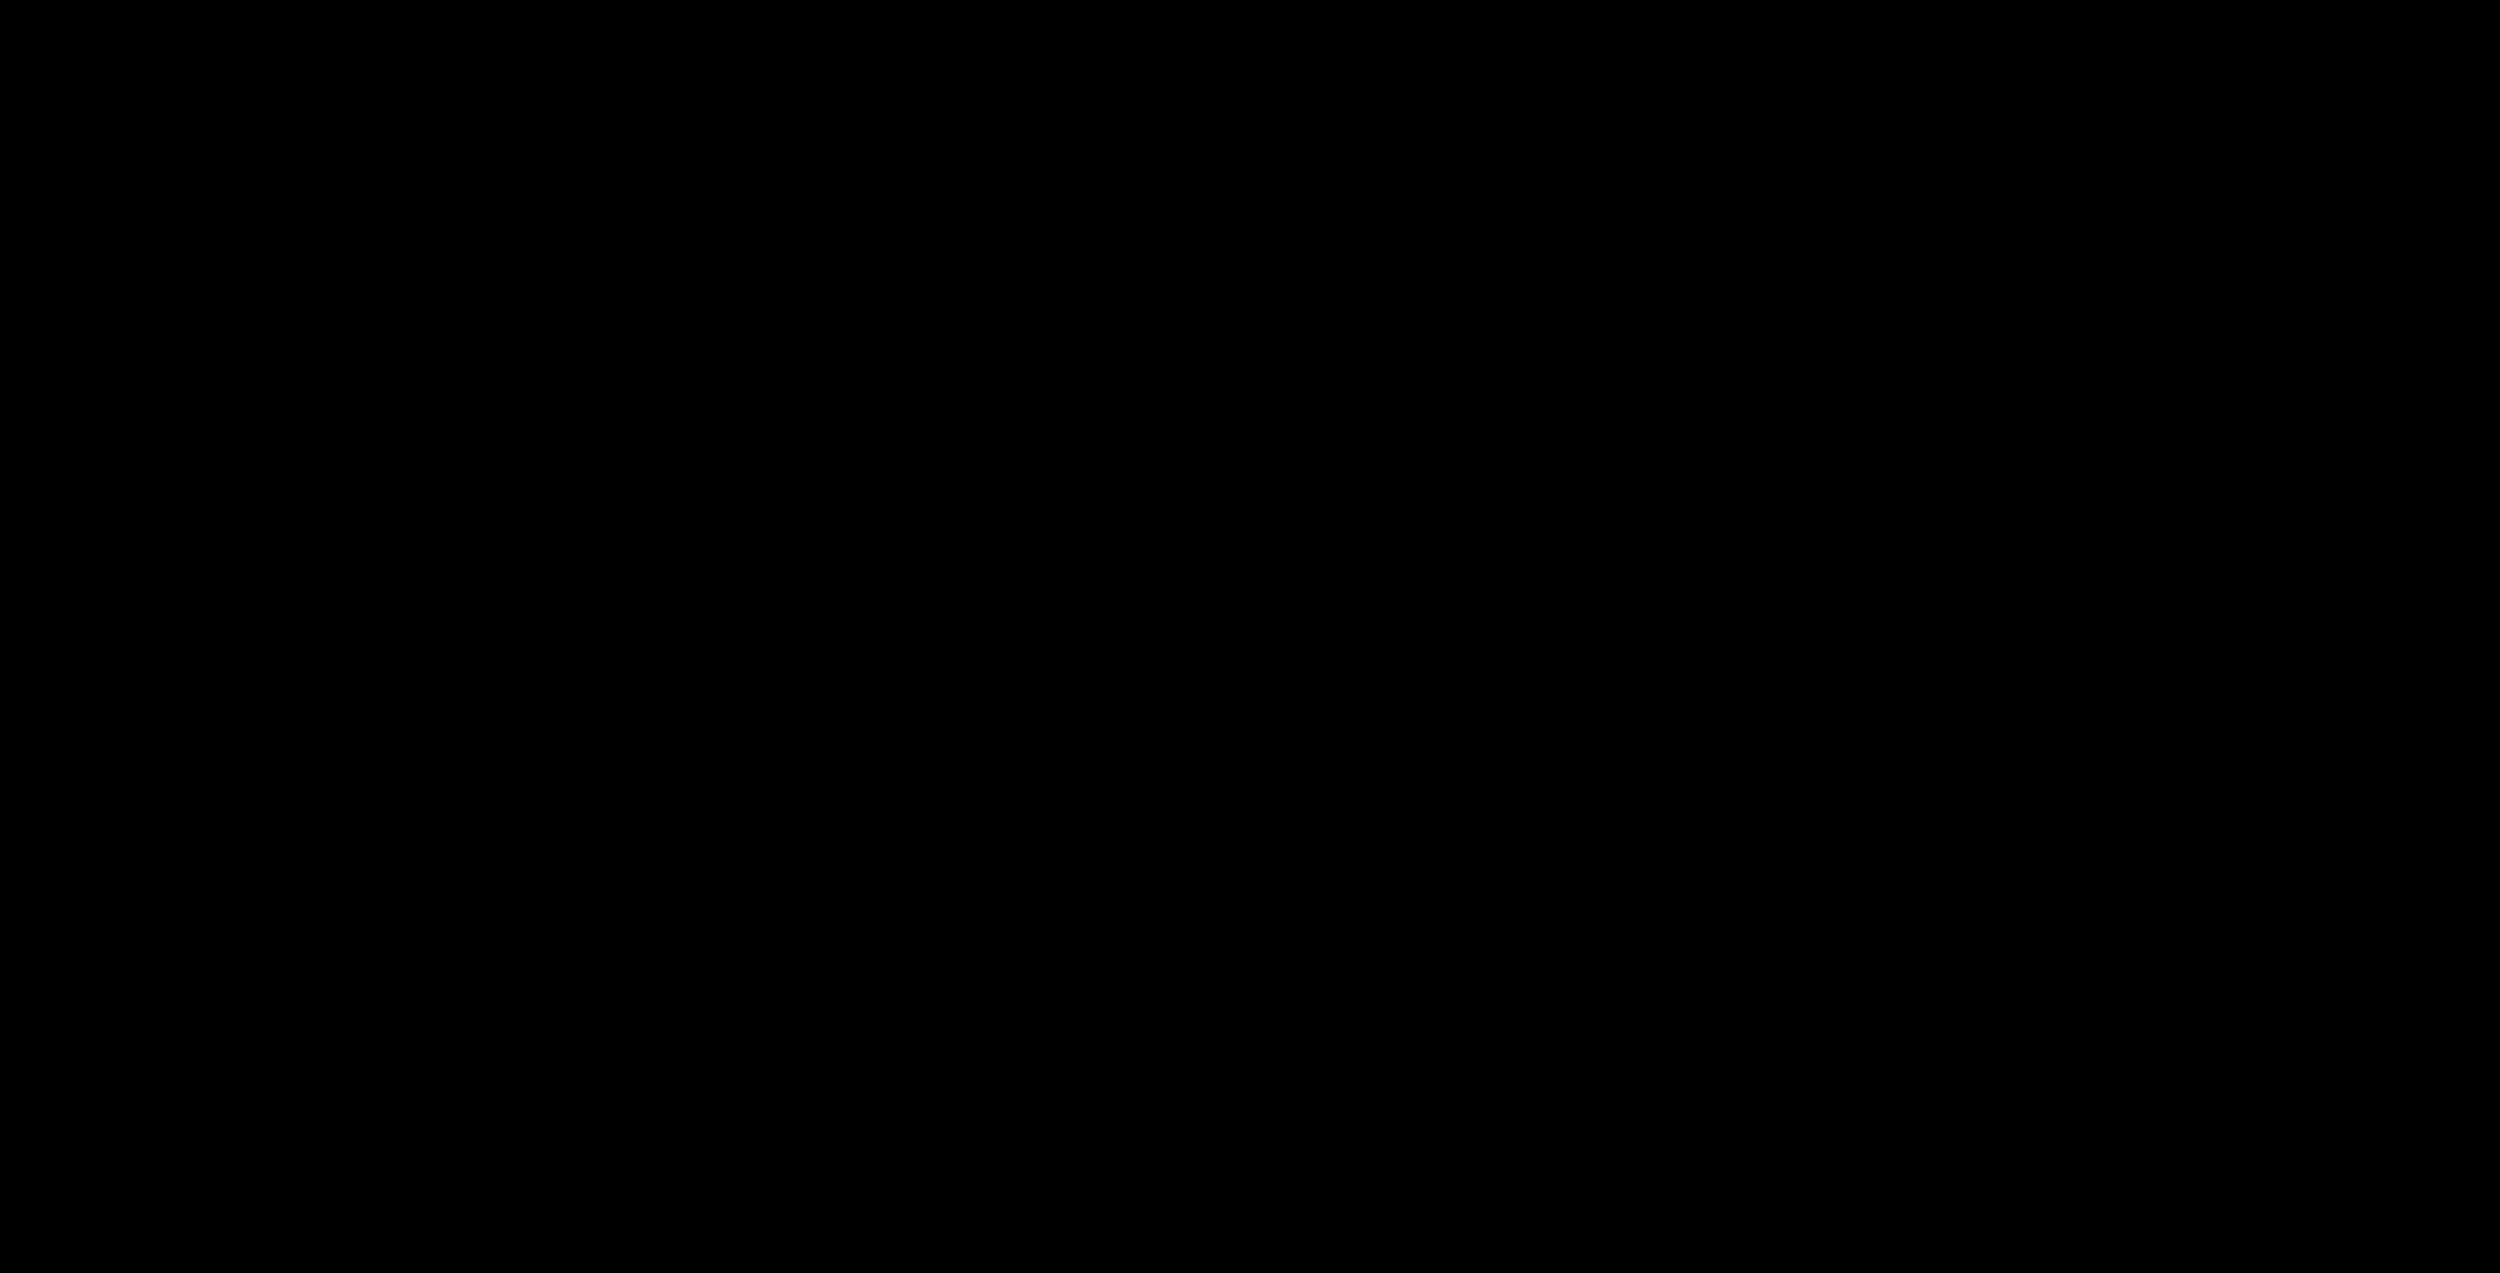 mdlcanc-01.png